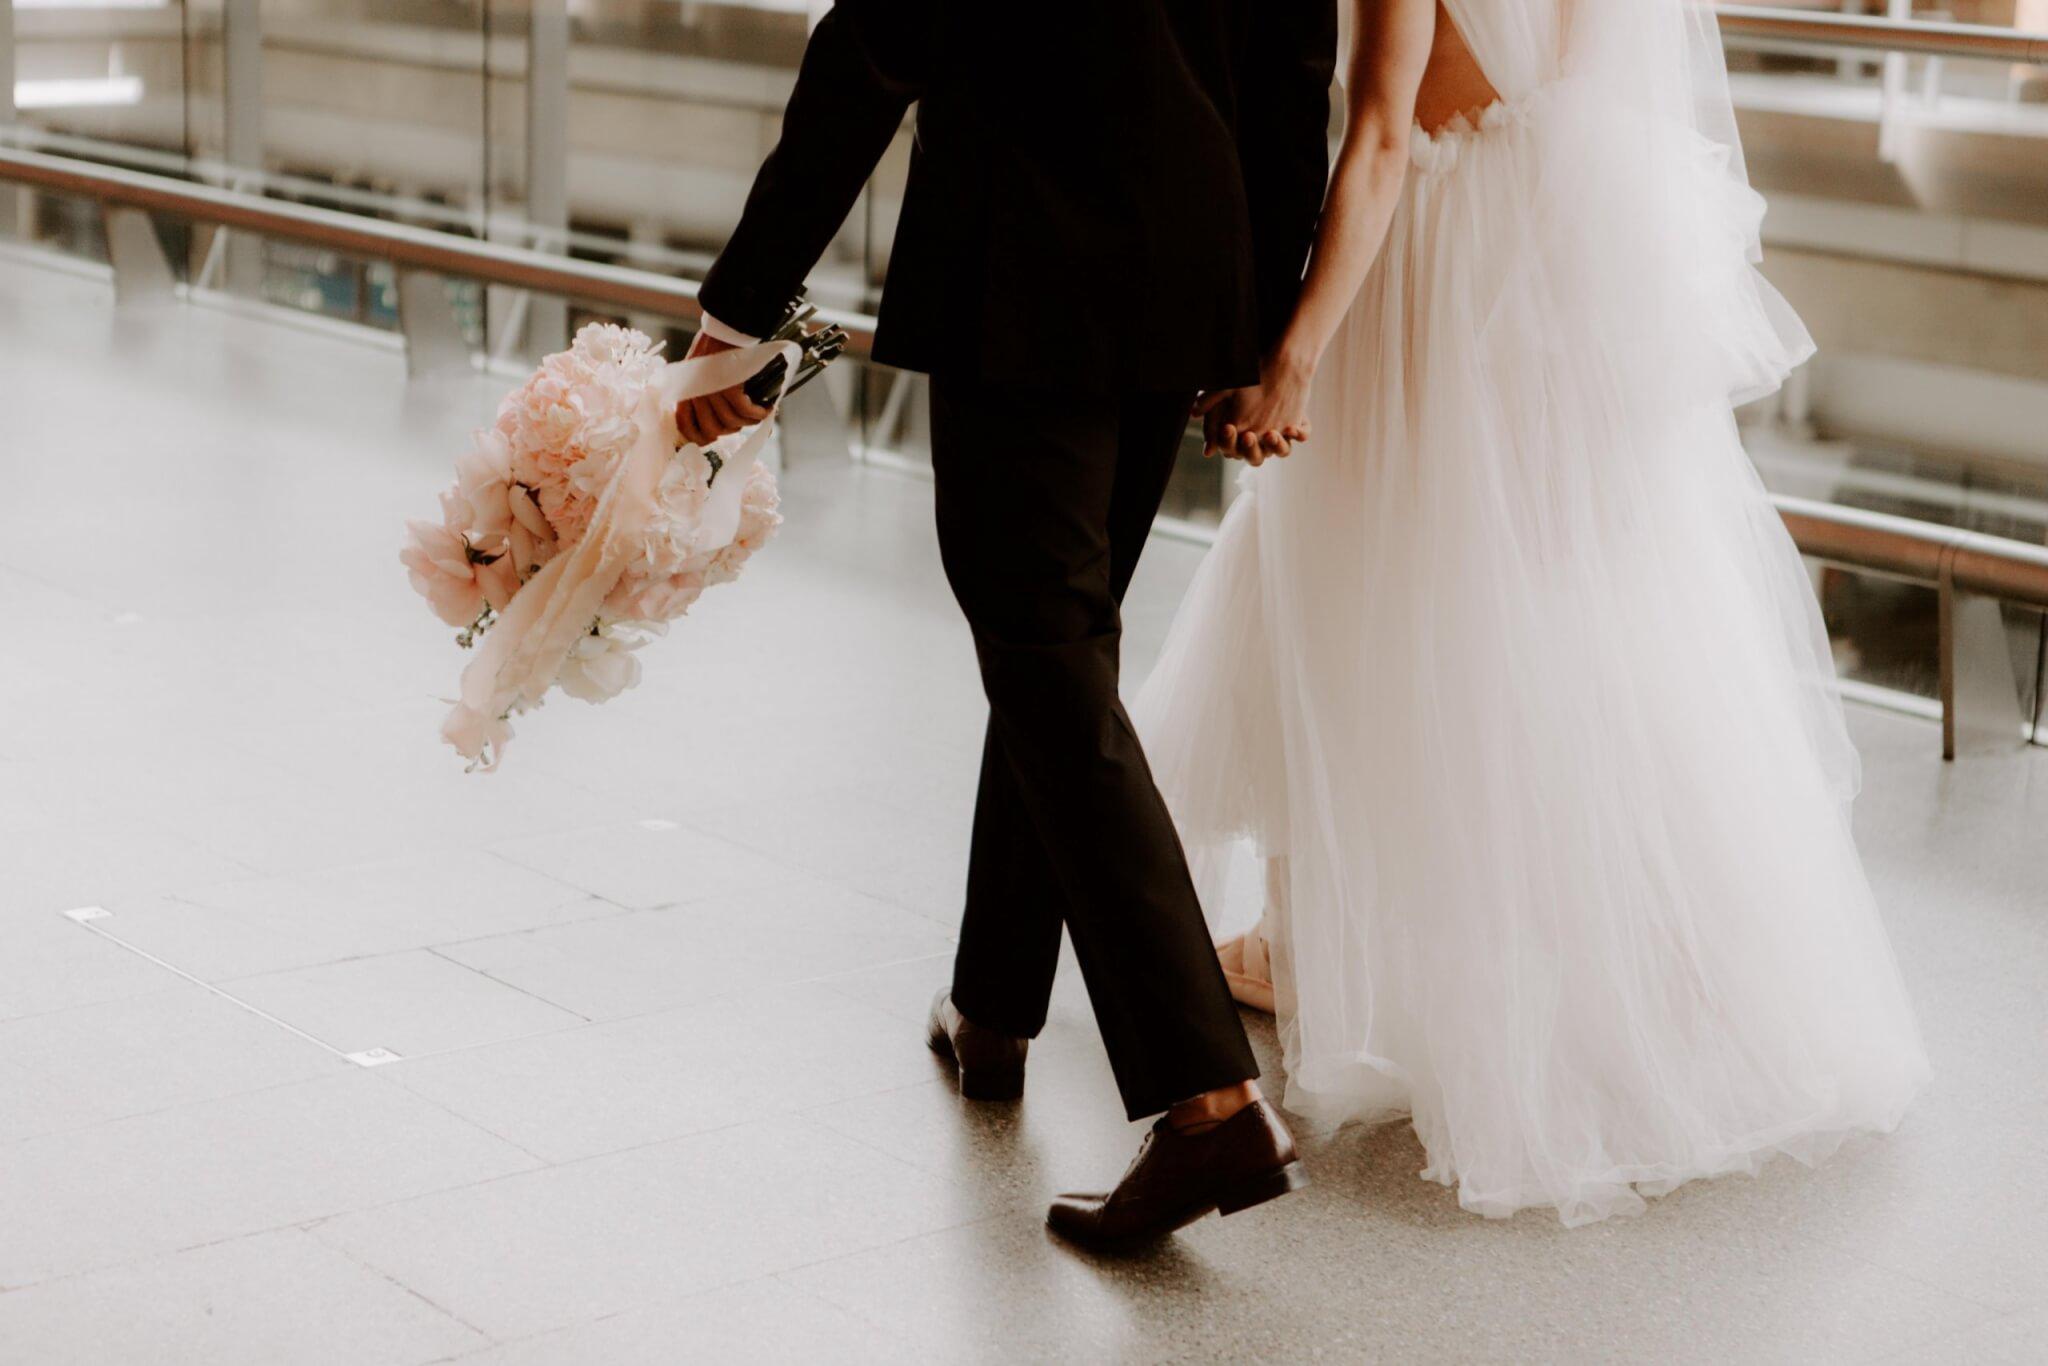 Weddings - St. Pancras